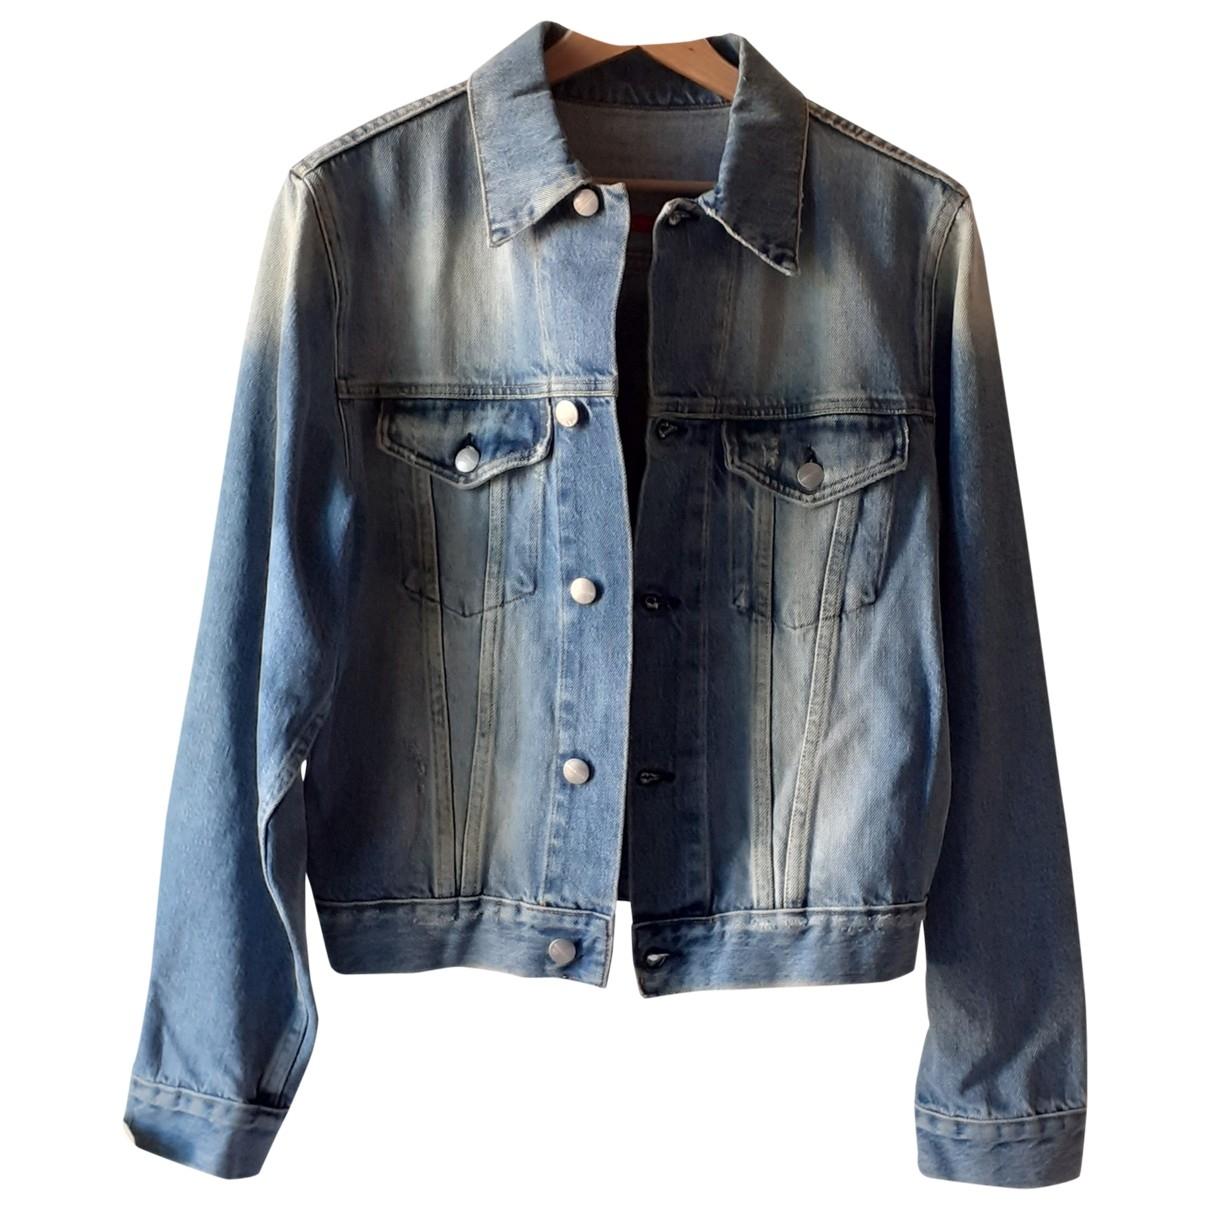 Daniele Alessandrini \N Blue Denim - Jeans jacket  for Men L International